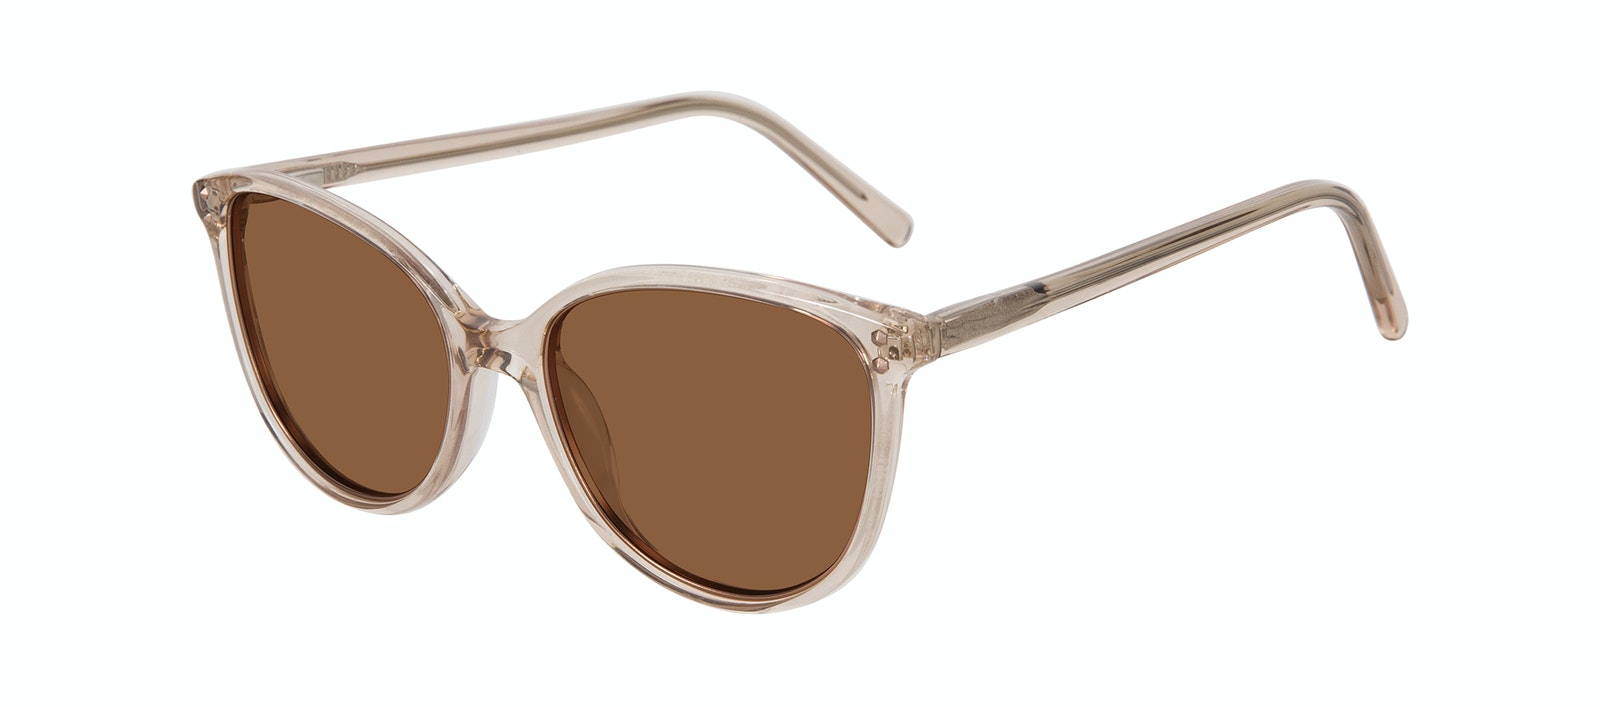 Affordable Fashion Glasses Cat Eye Sunglasses Women Imagine Petite Shine Blond Tilt